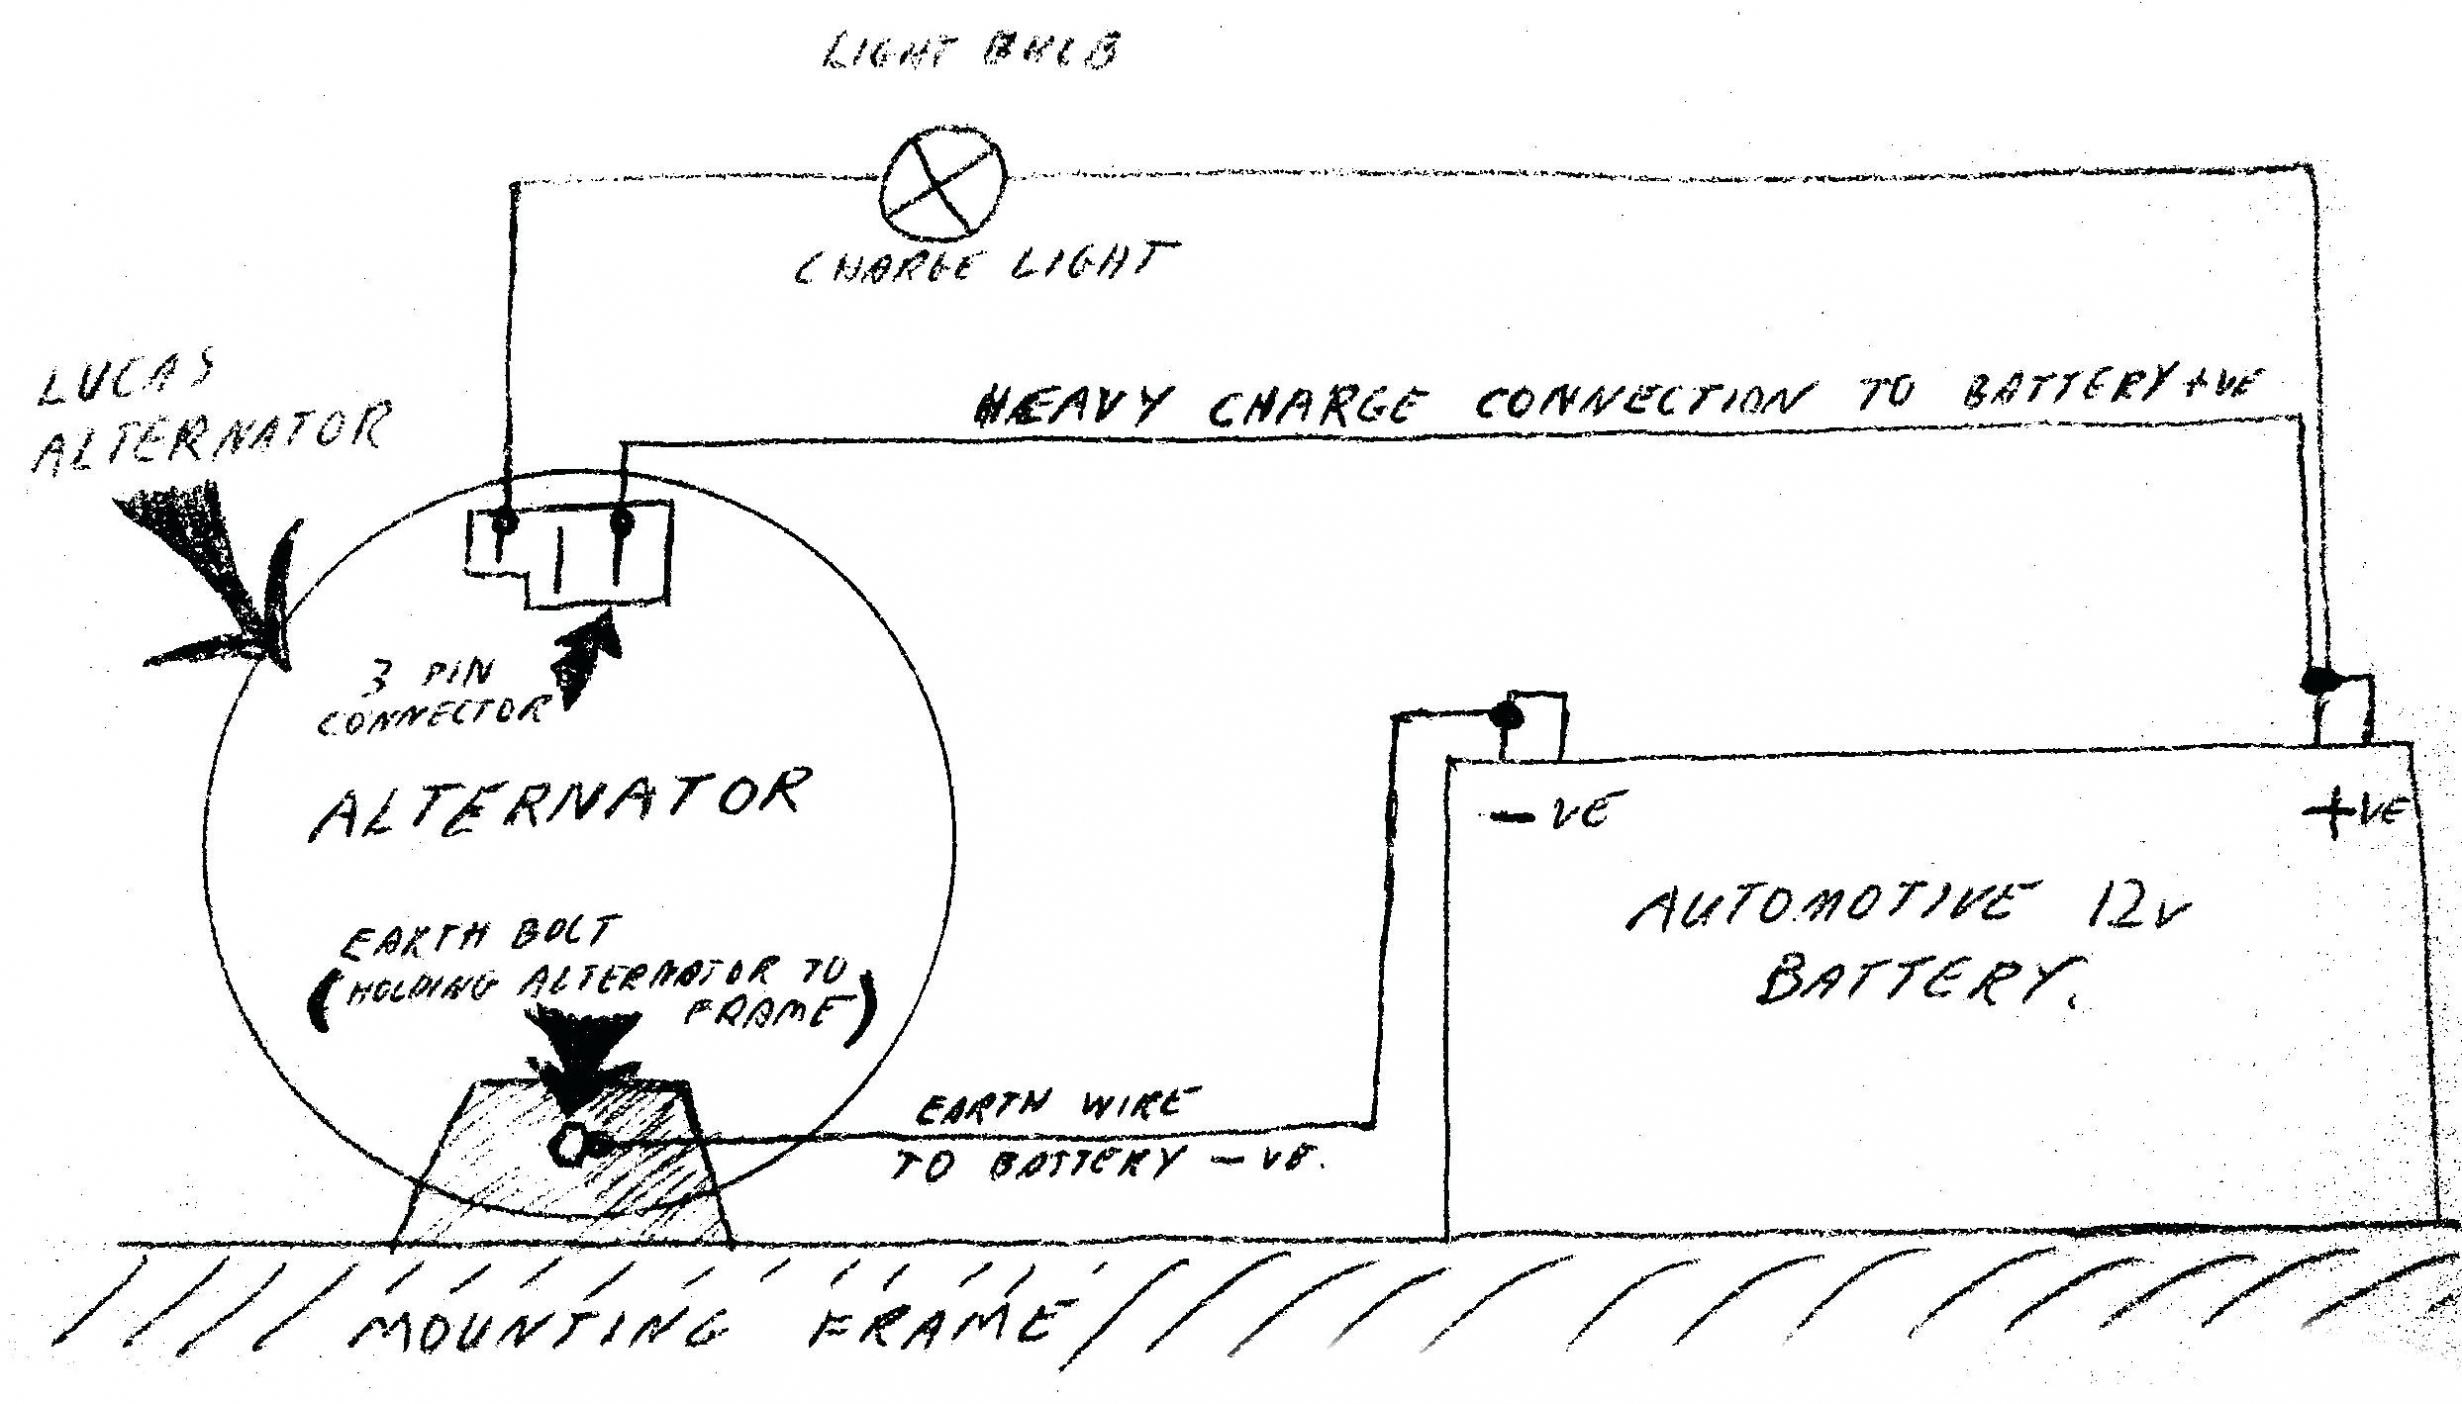 Gm Alternator Wiring Diagram Internal Regulator New Gm Alternator - Gm Alternator Wiring Diagram Internal Regulator